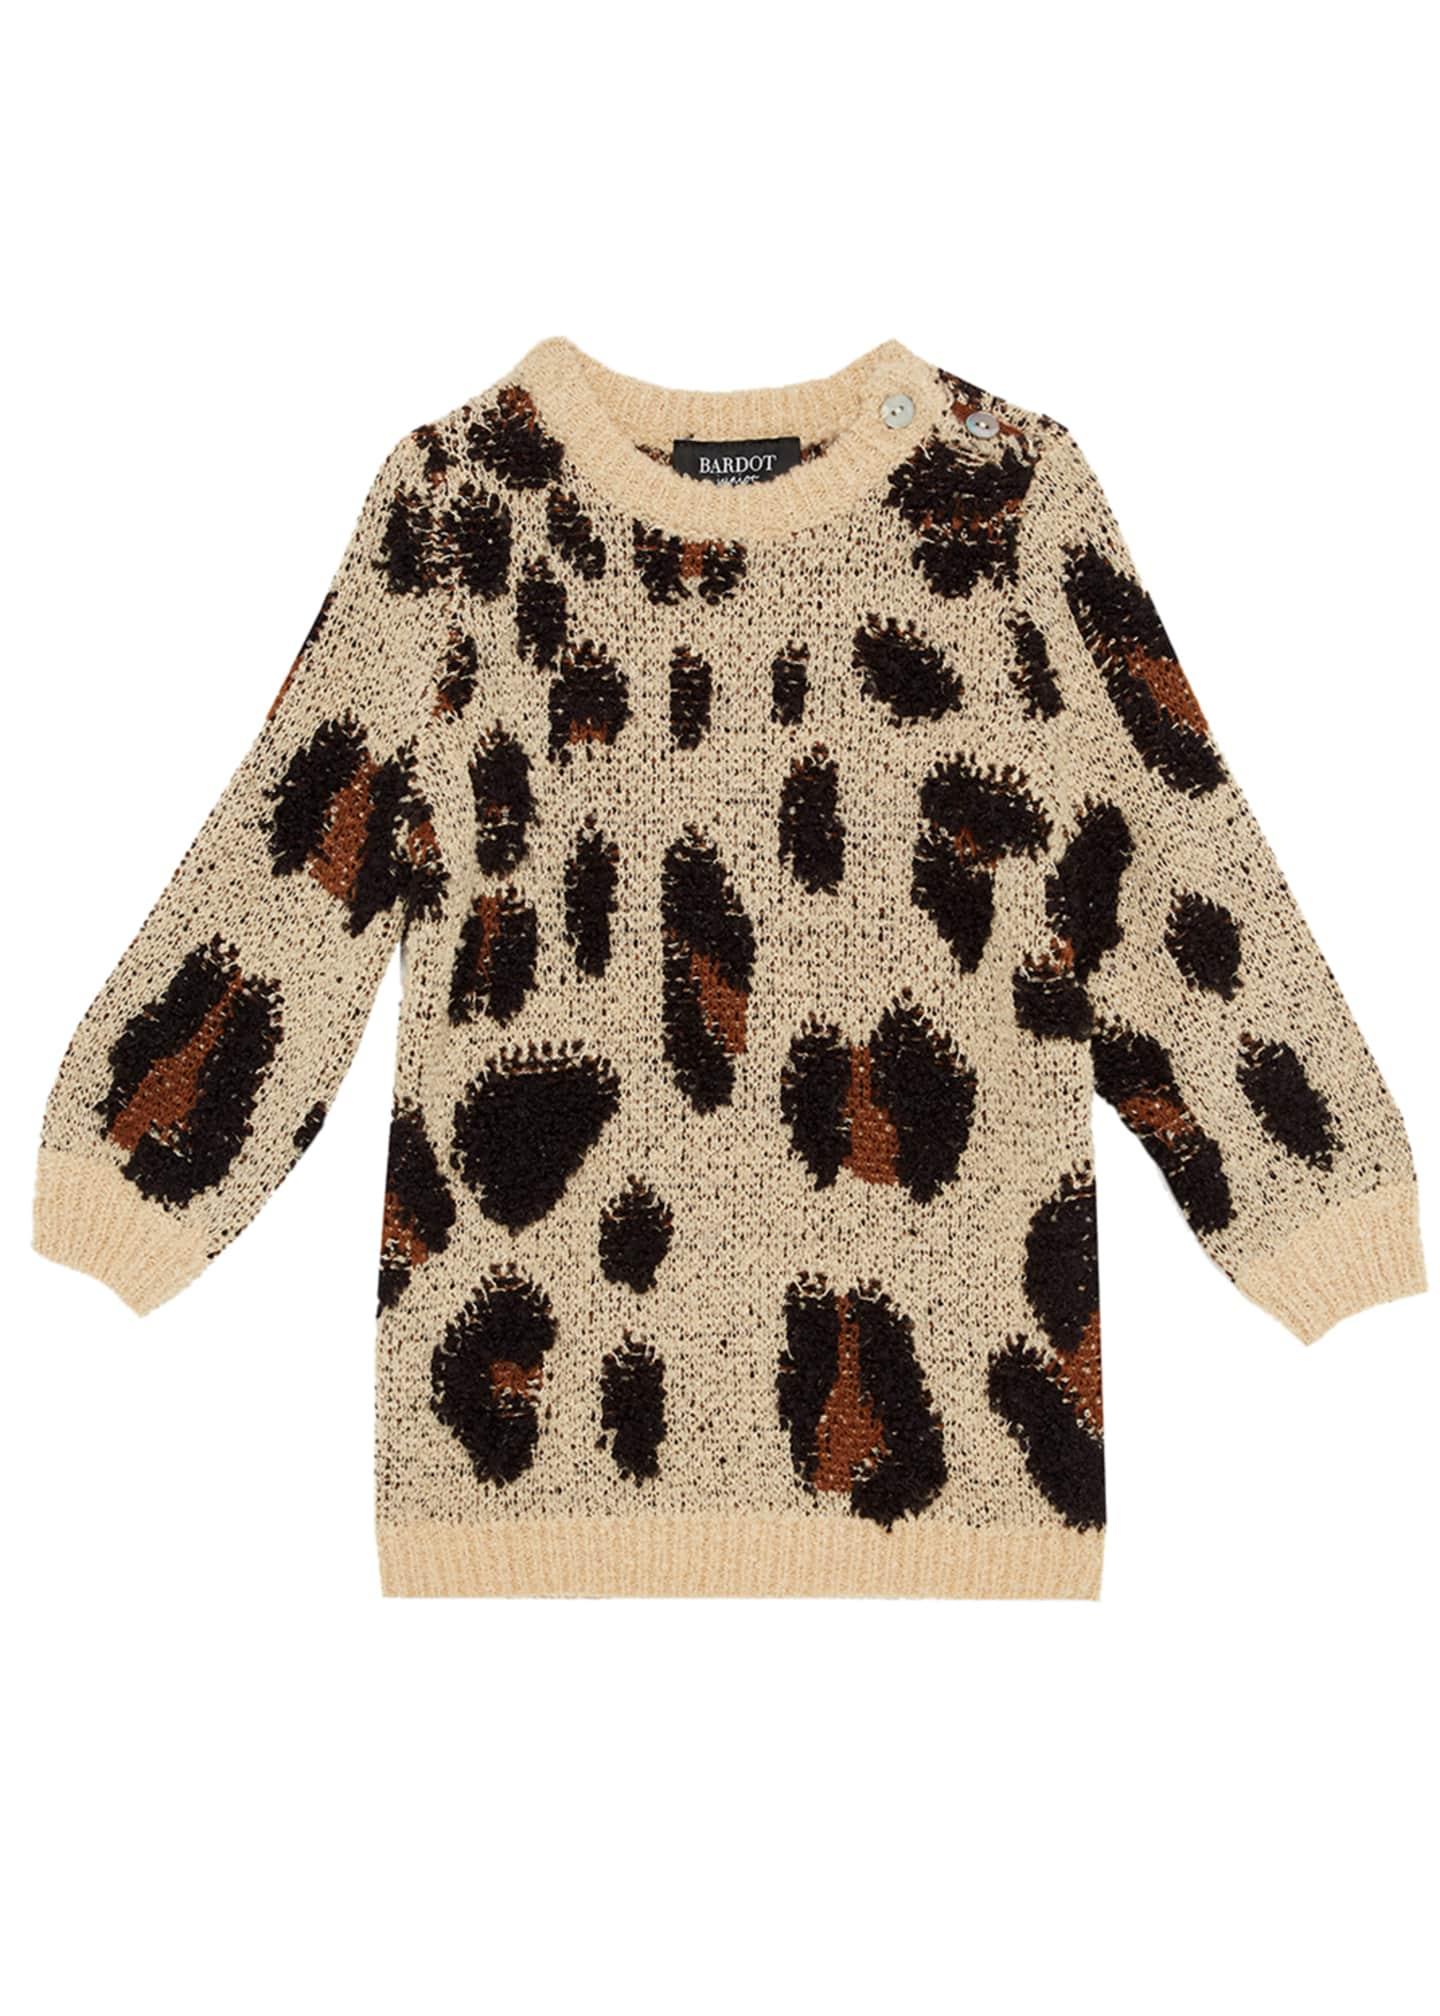 Bardot Junior Girl's Eryn Animal Knit Sweater Dress,